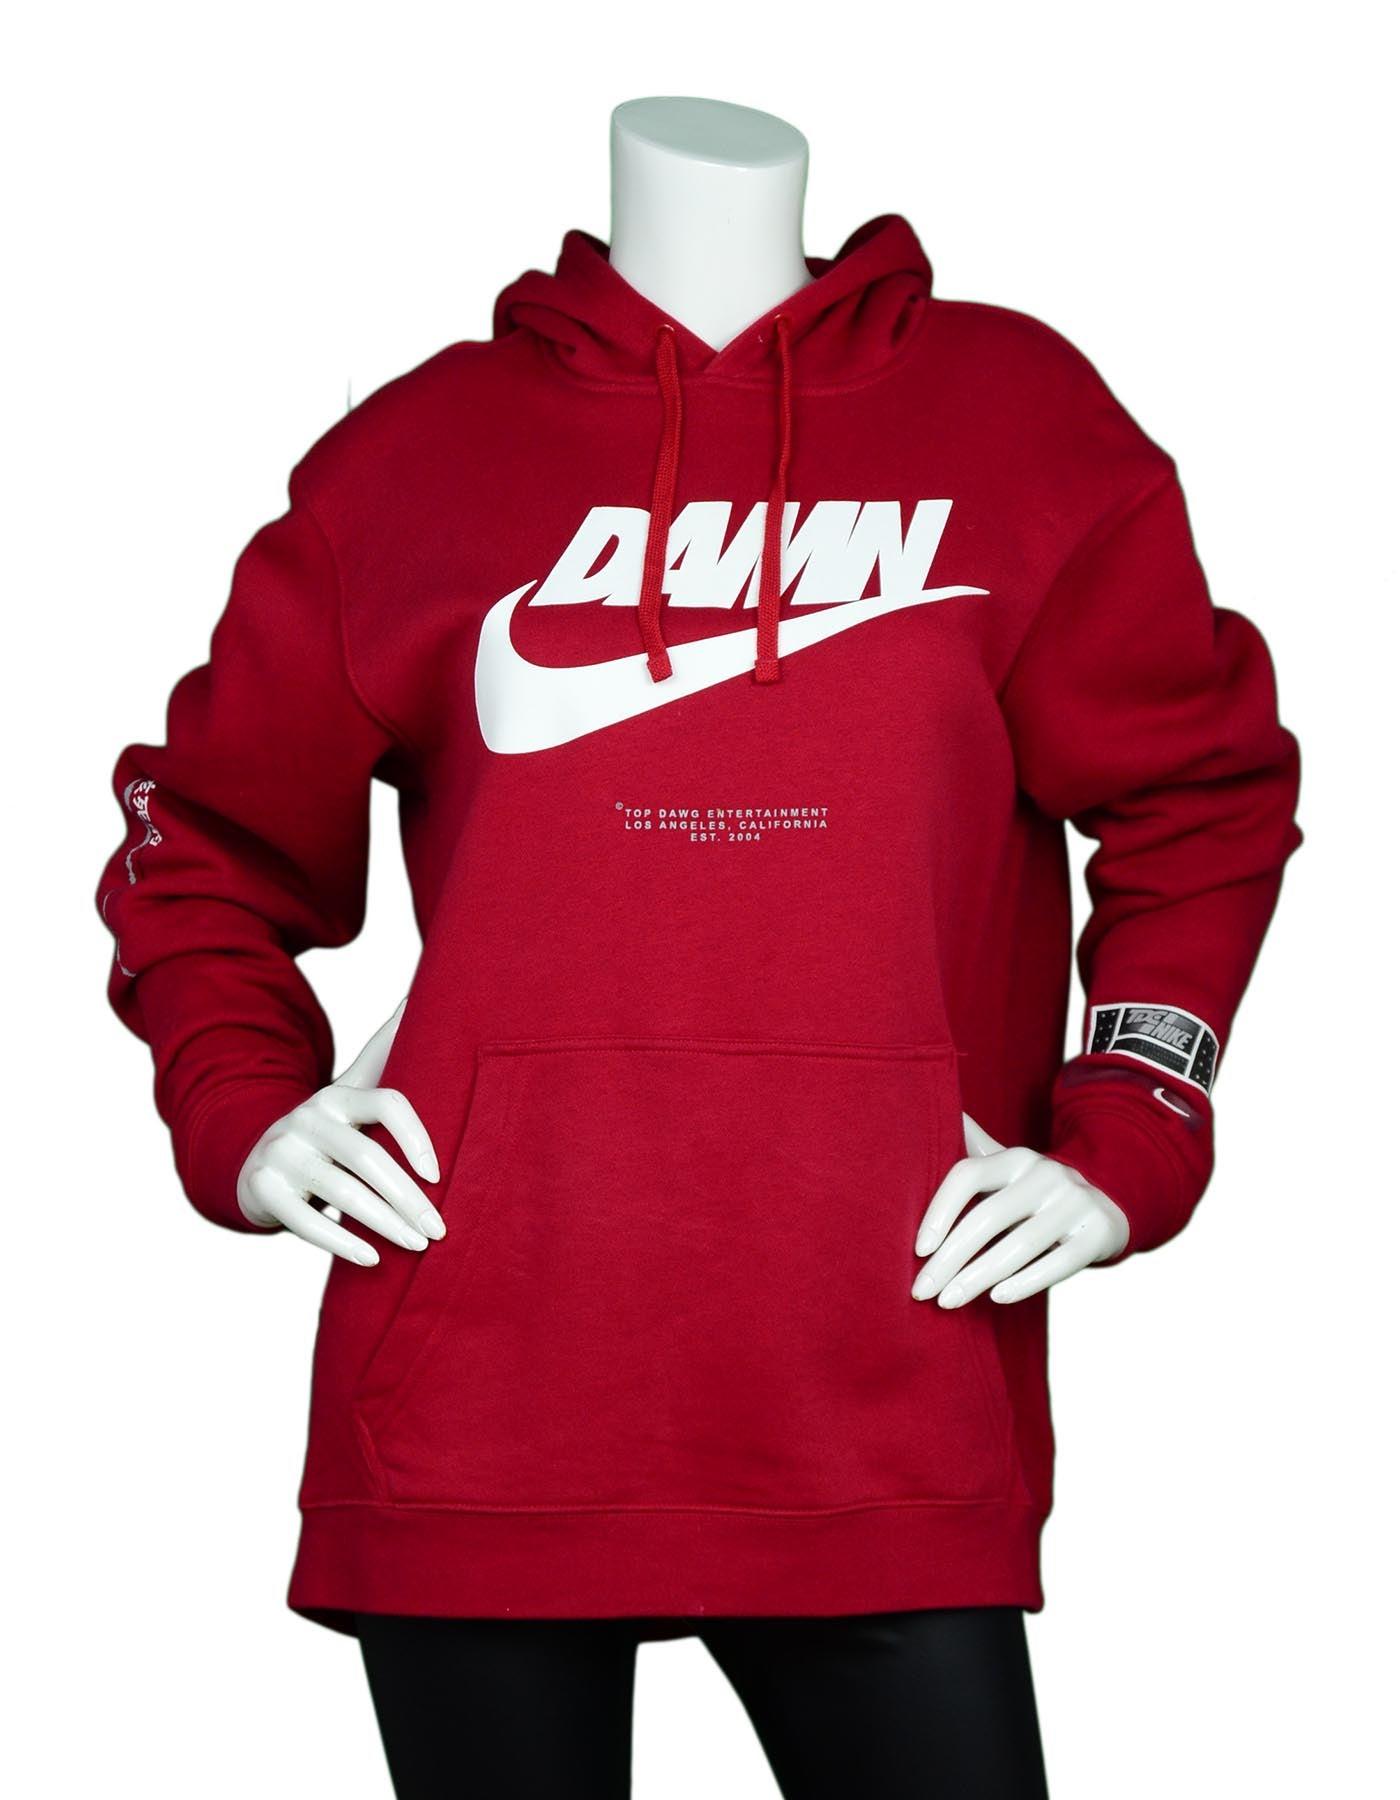 nike damn hoodie